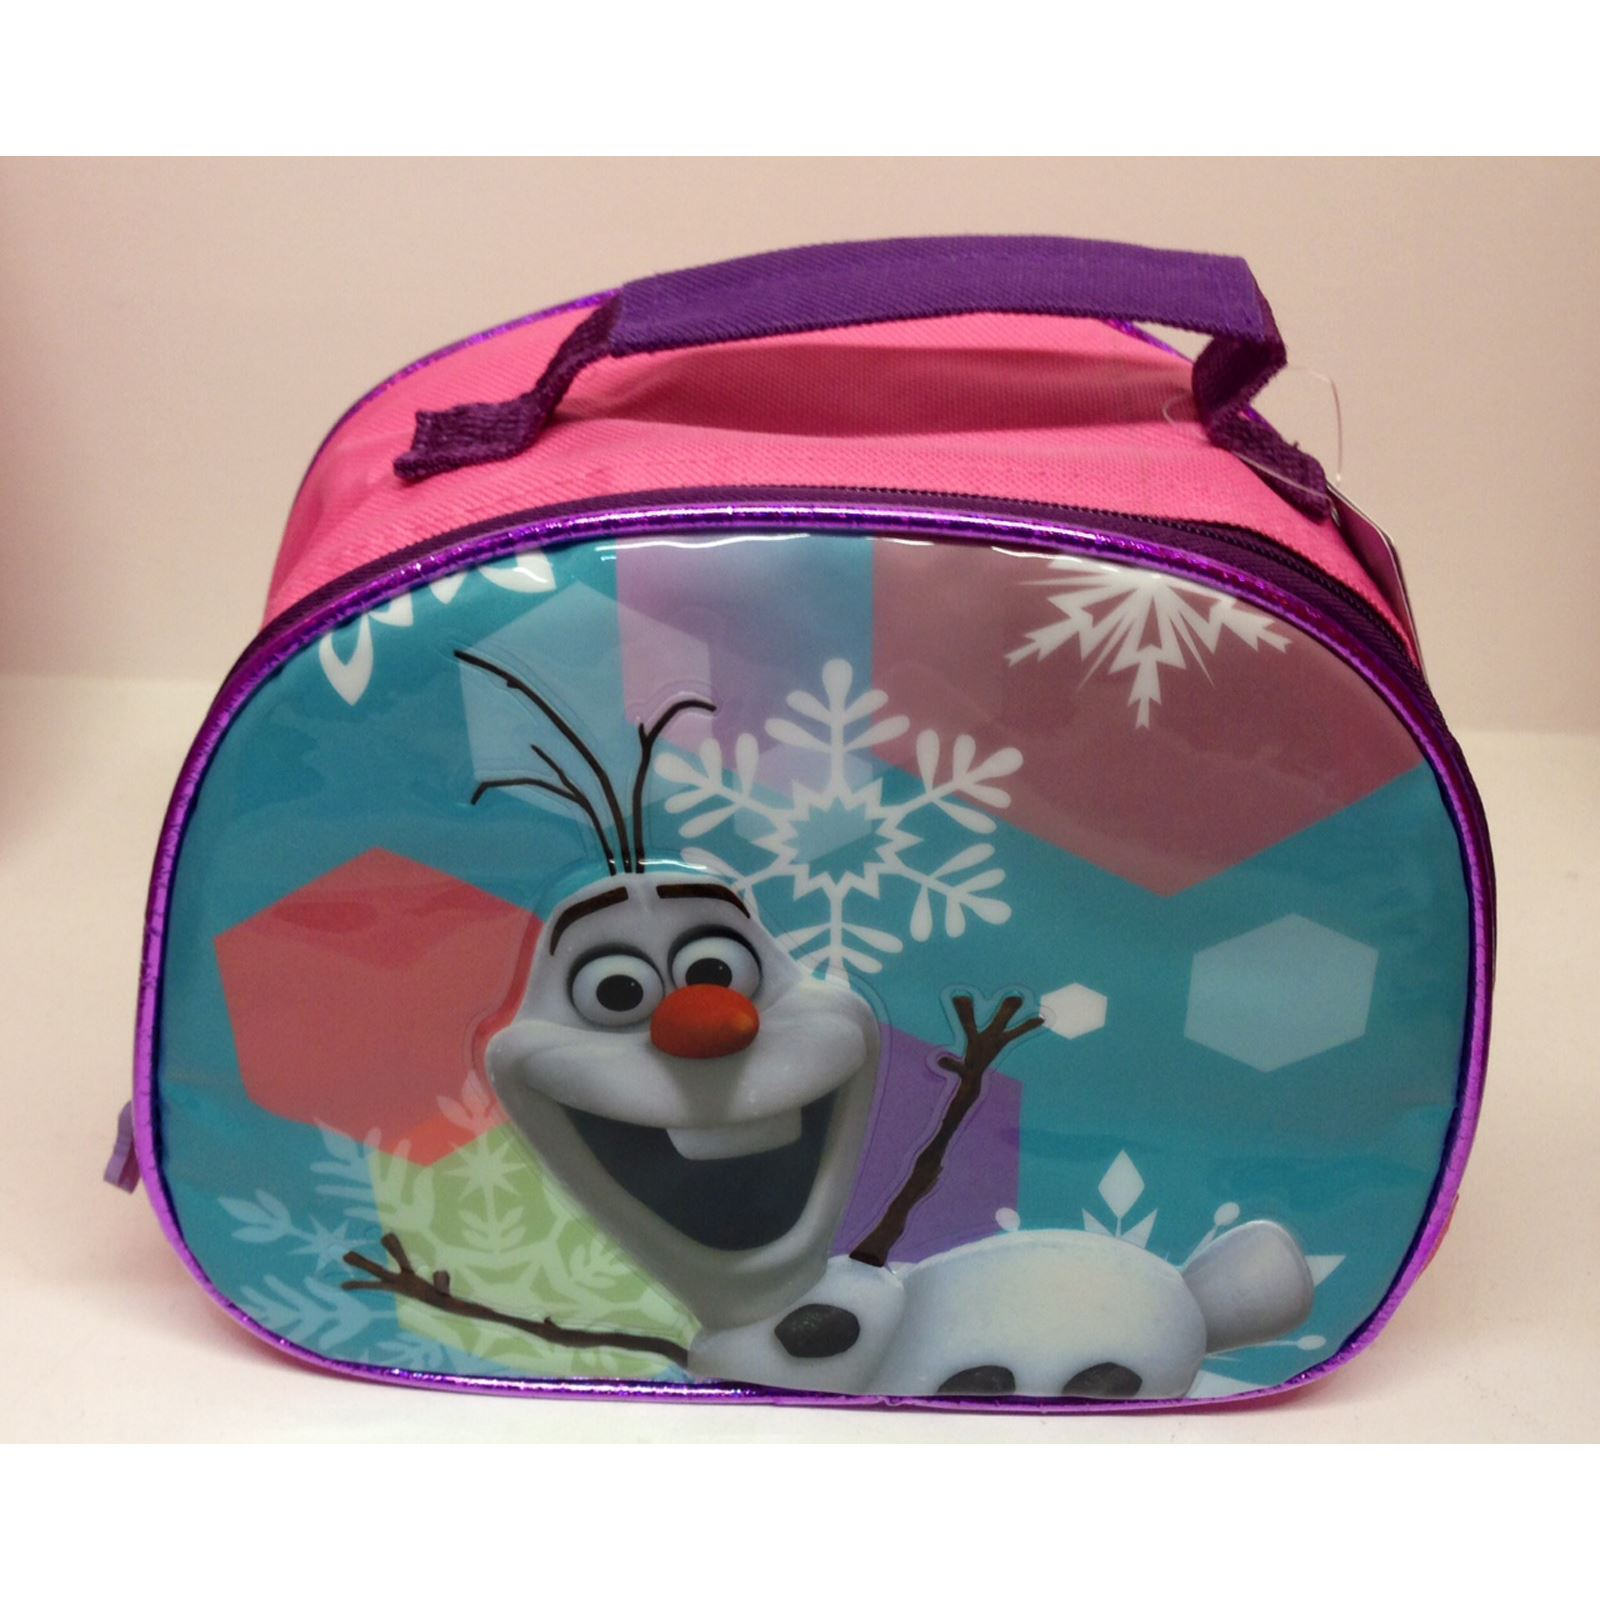 Disney frozen mochilas almuerzo bolsa con ruedas - Bolsa de almuerzo ...